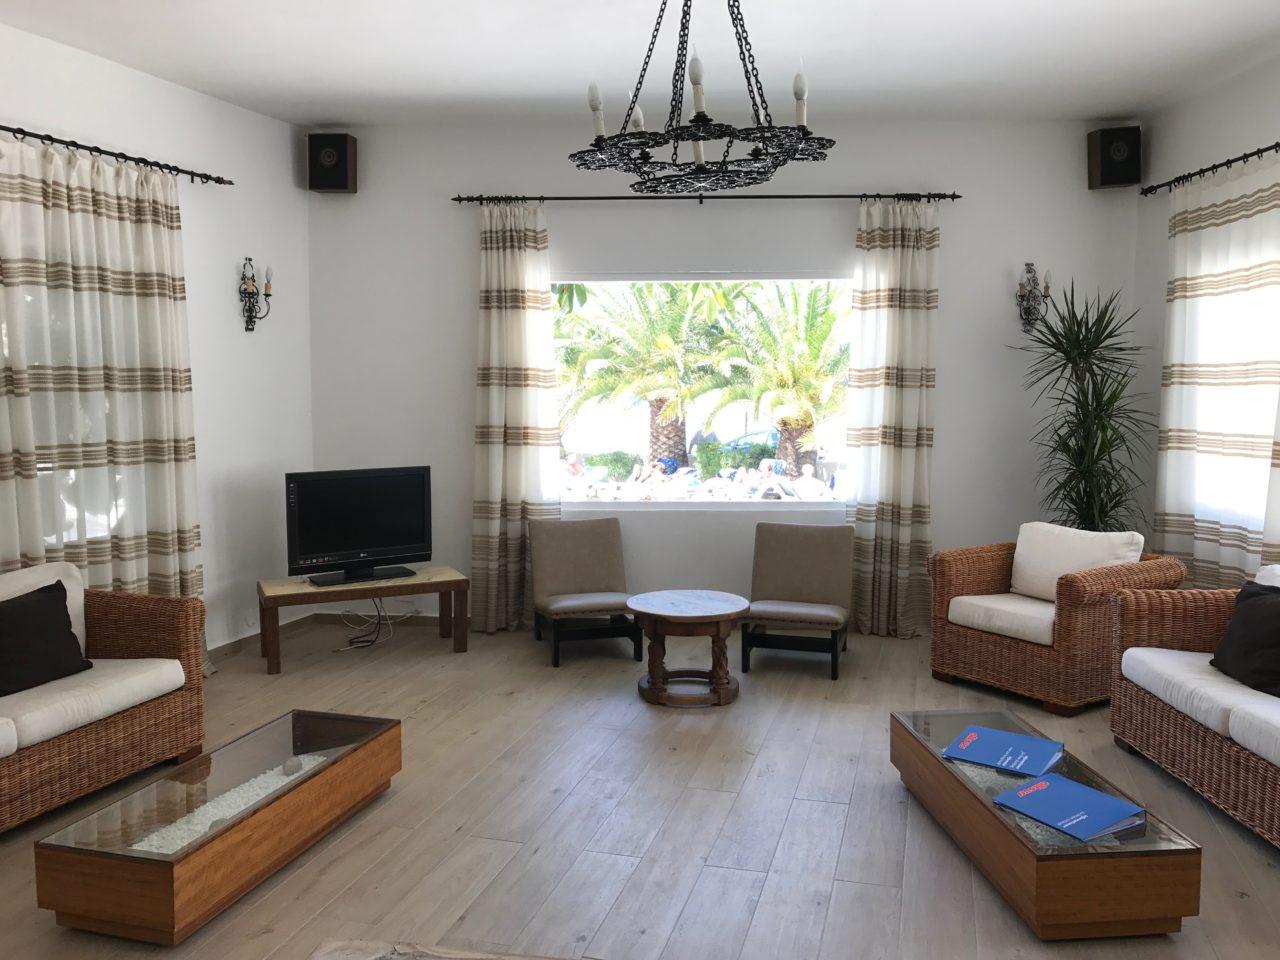 Hotel Lobby Lounge Living Room Windows